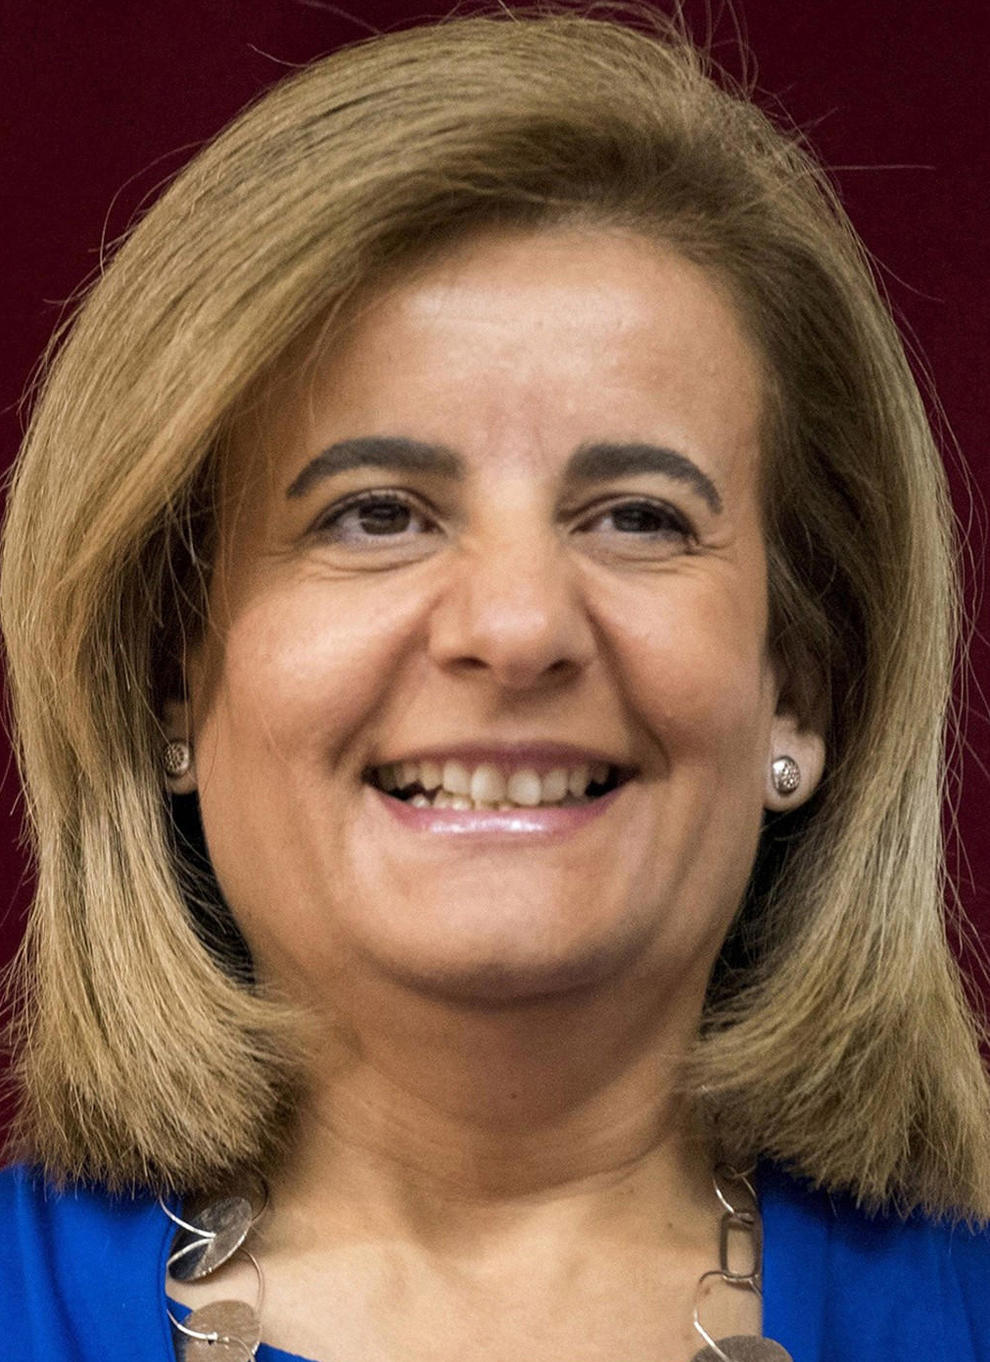 Repeteixen 7 ministres, se n'incorporen 6 de nous i cauen Fernández Díaz i Margallo.